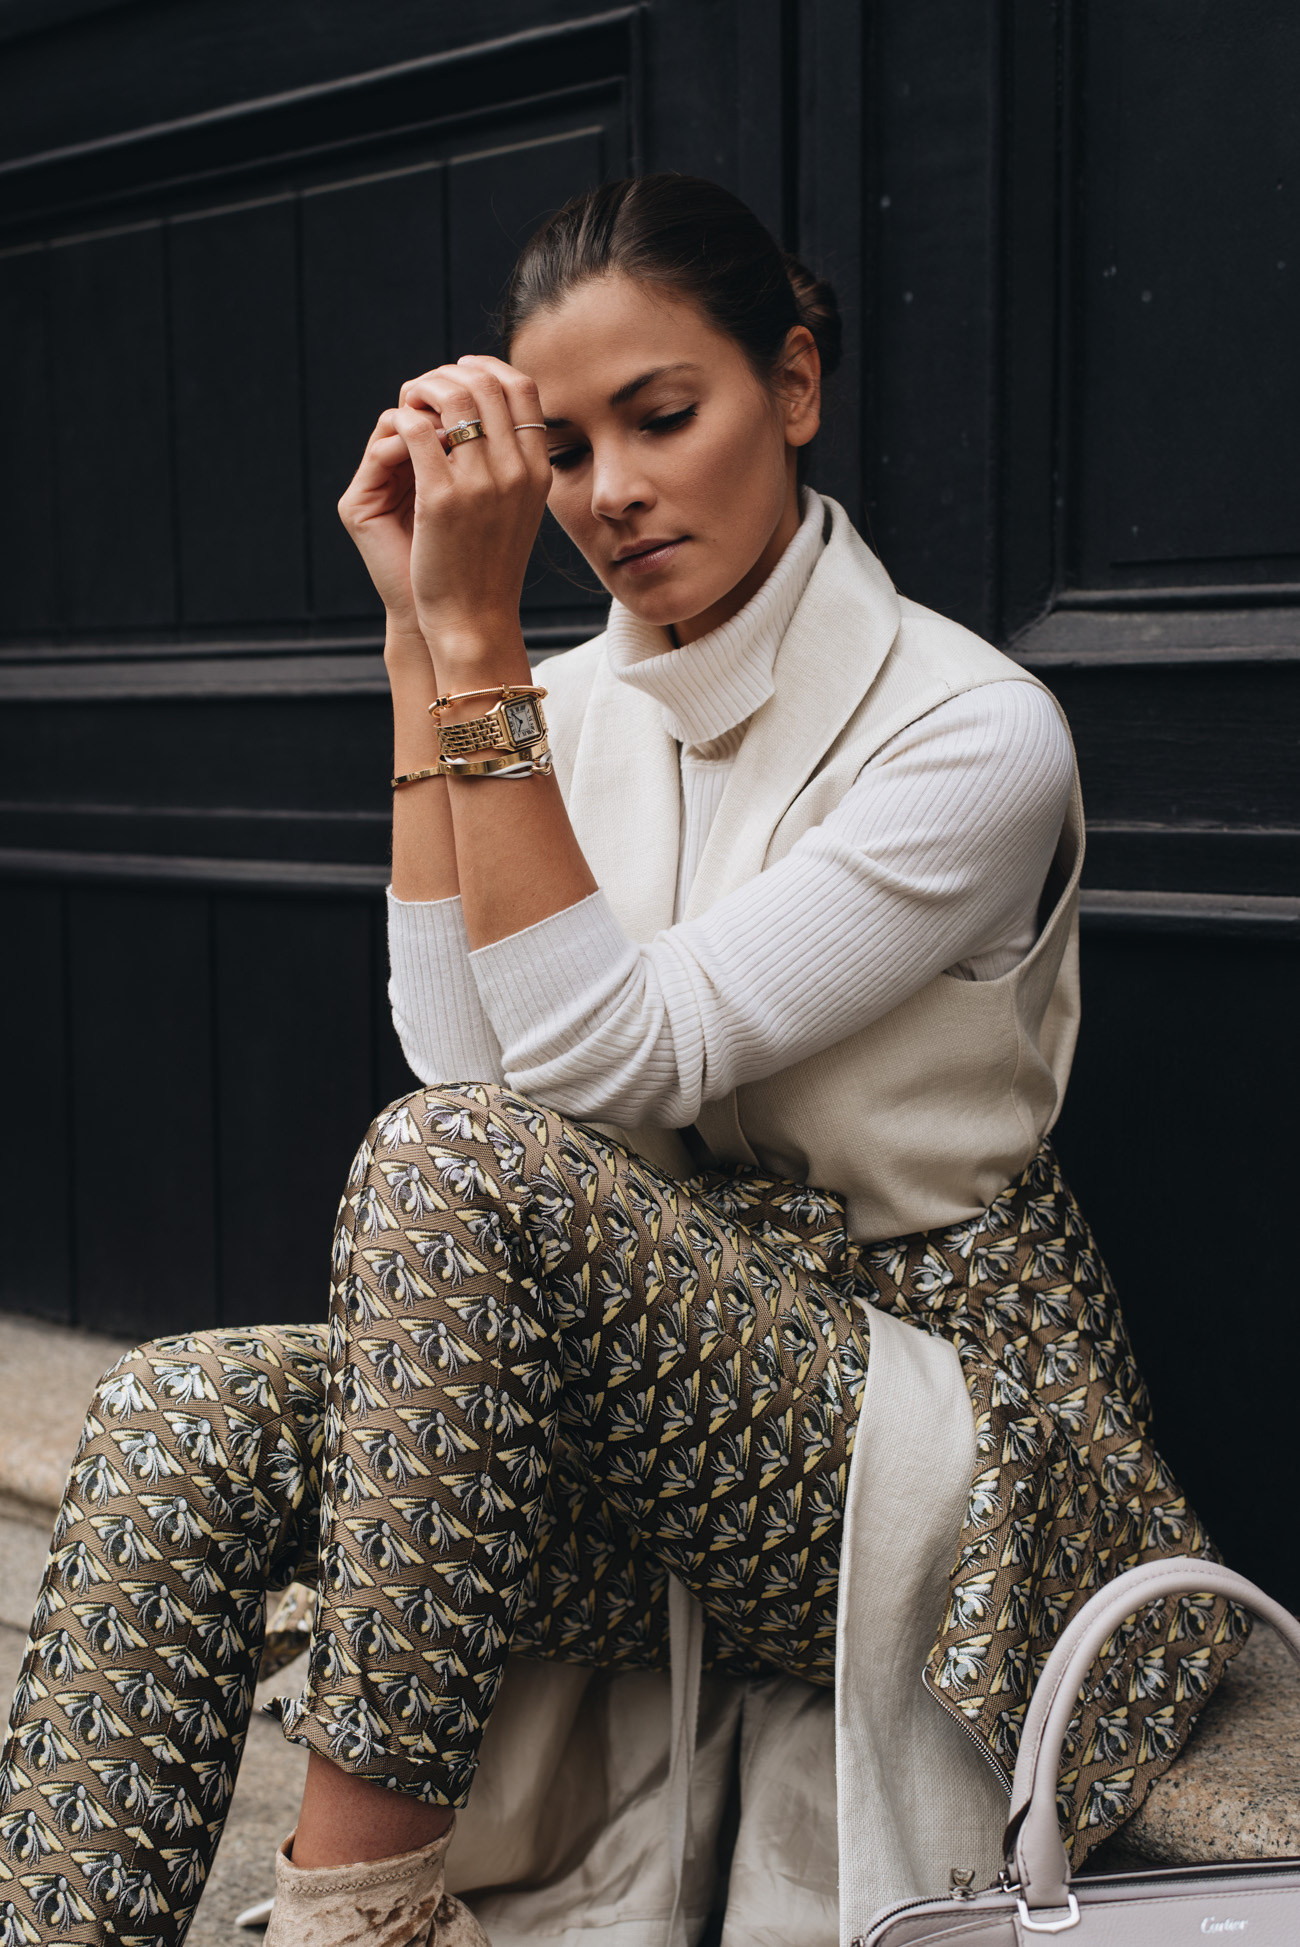 Modetrends-2018-Layering-Hosenanzug-nina-schwichtenberg-fashiioncarpet